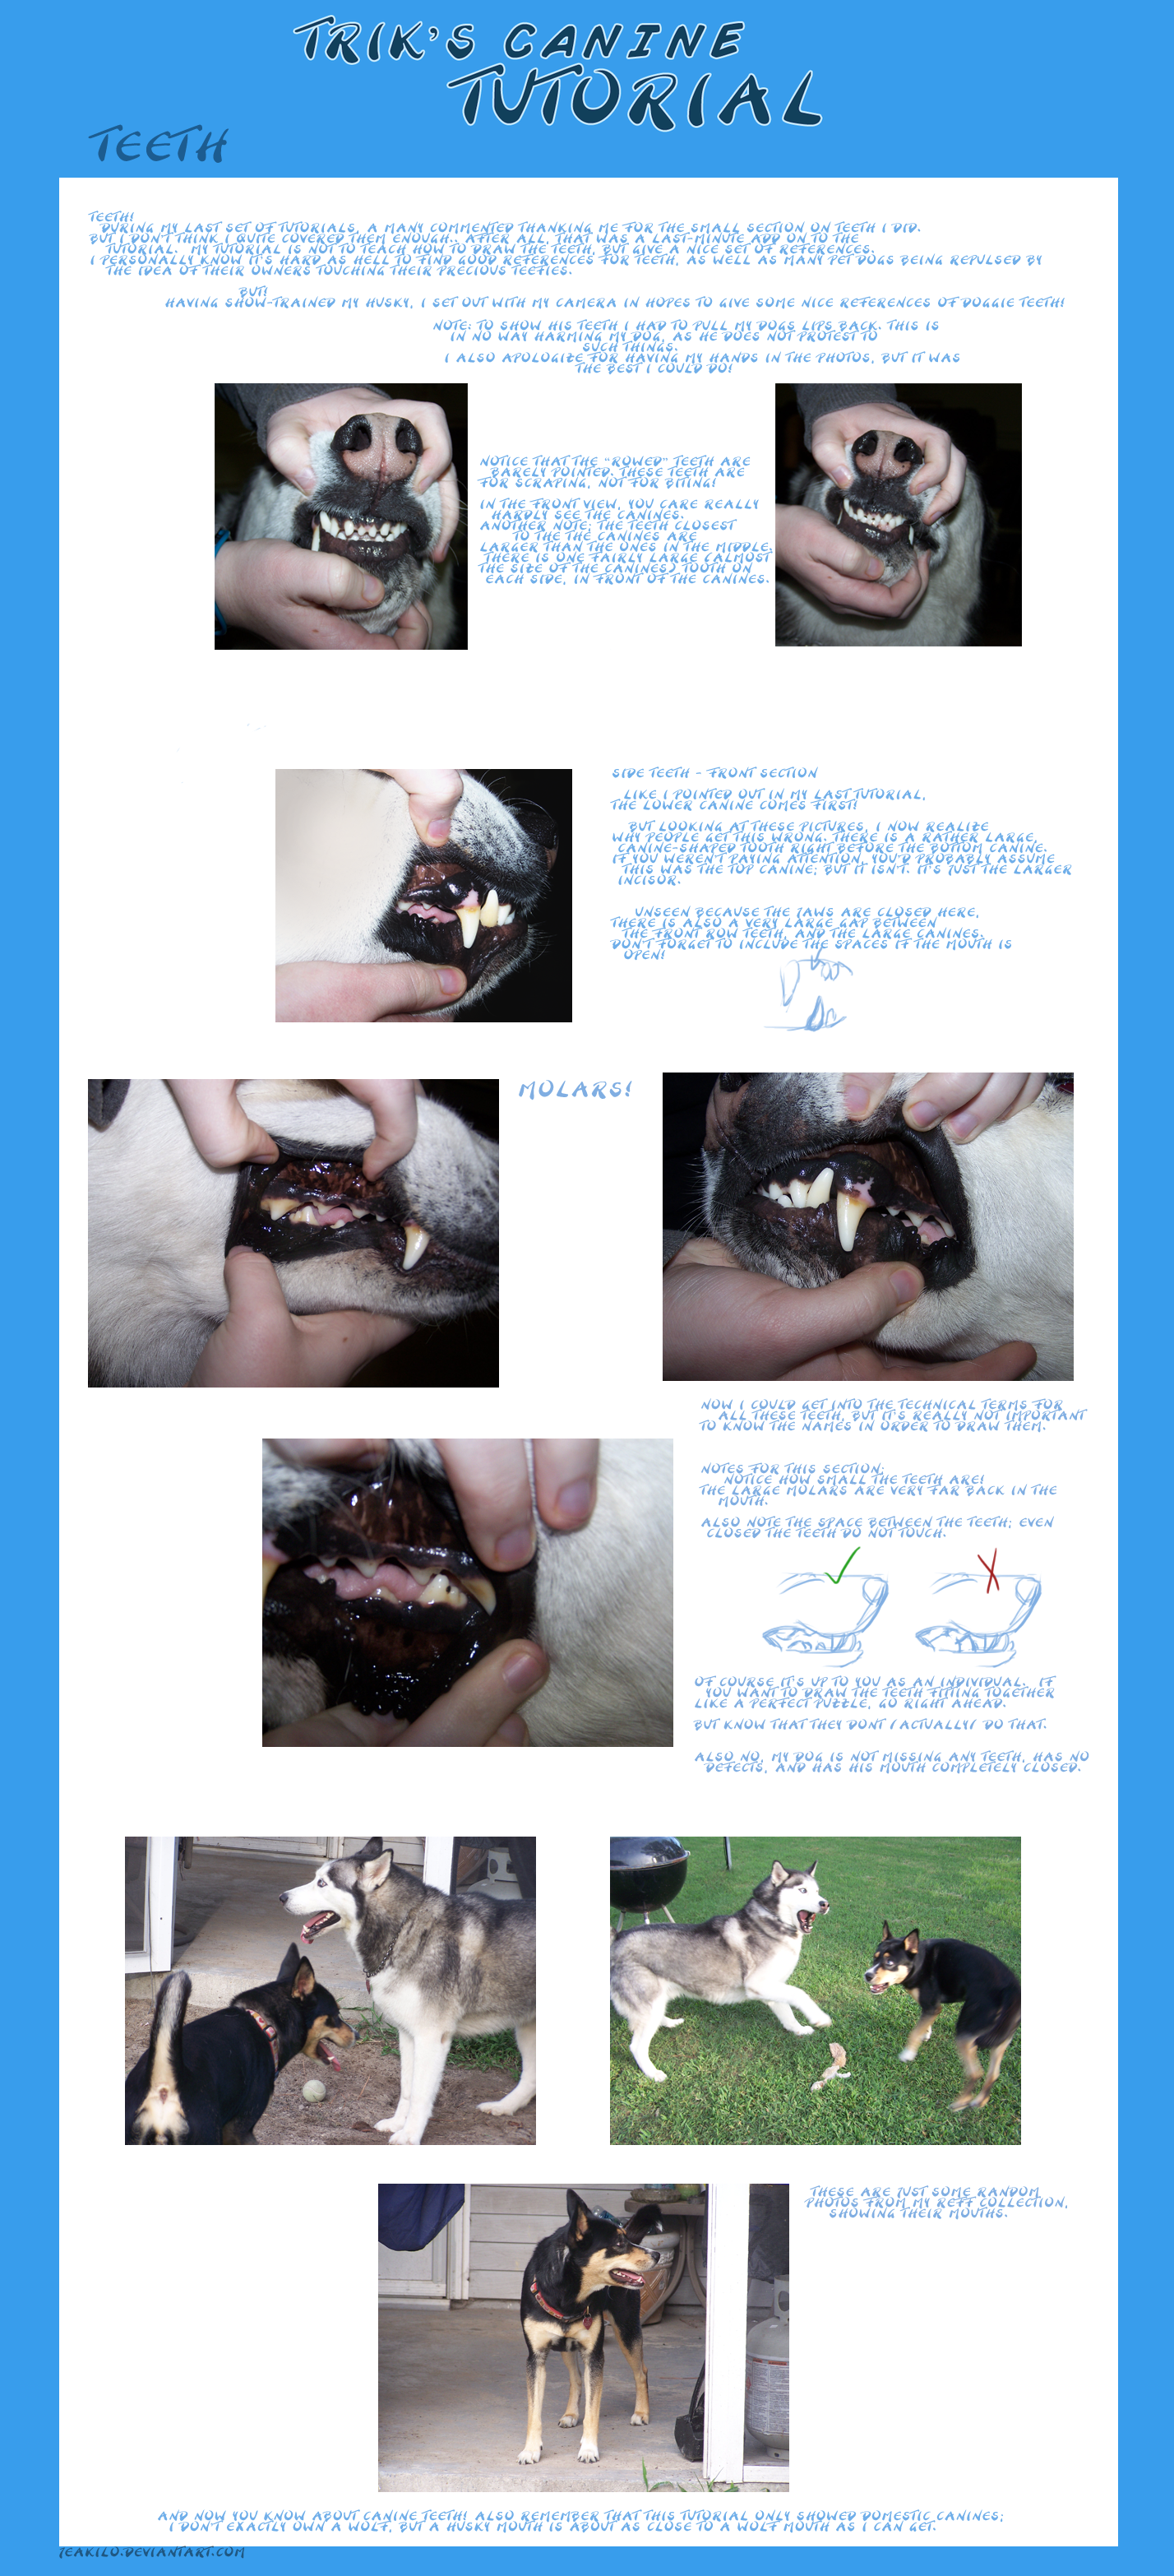 Trik's Canine Tutorial: Teeth by Jeakilo